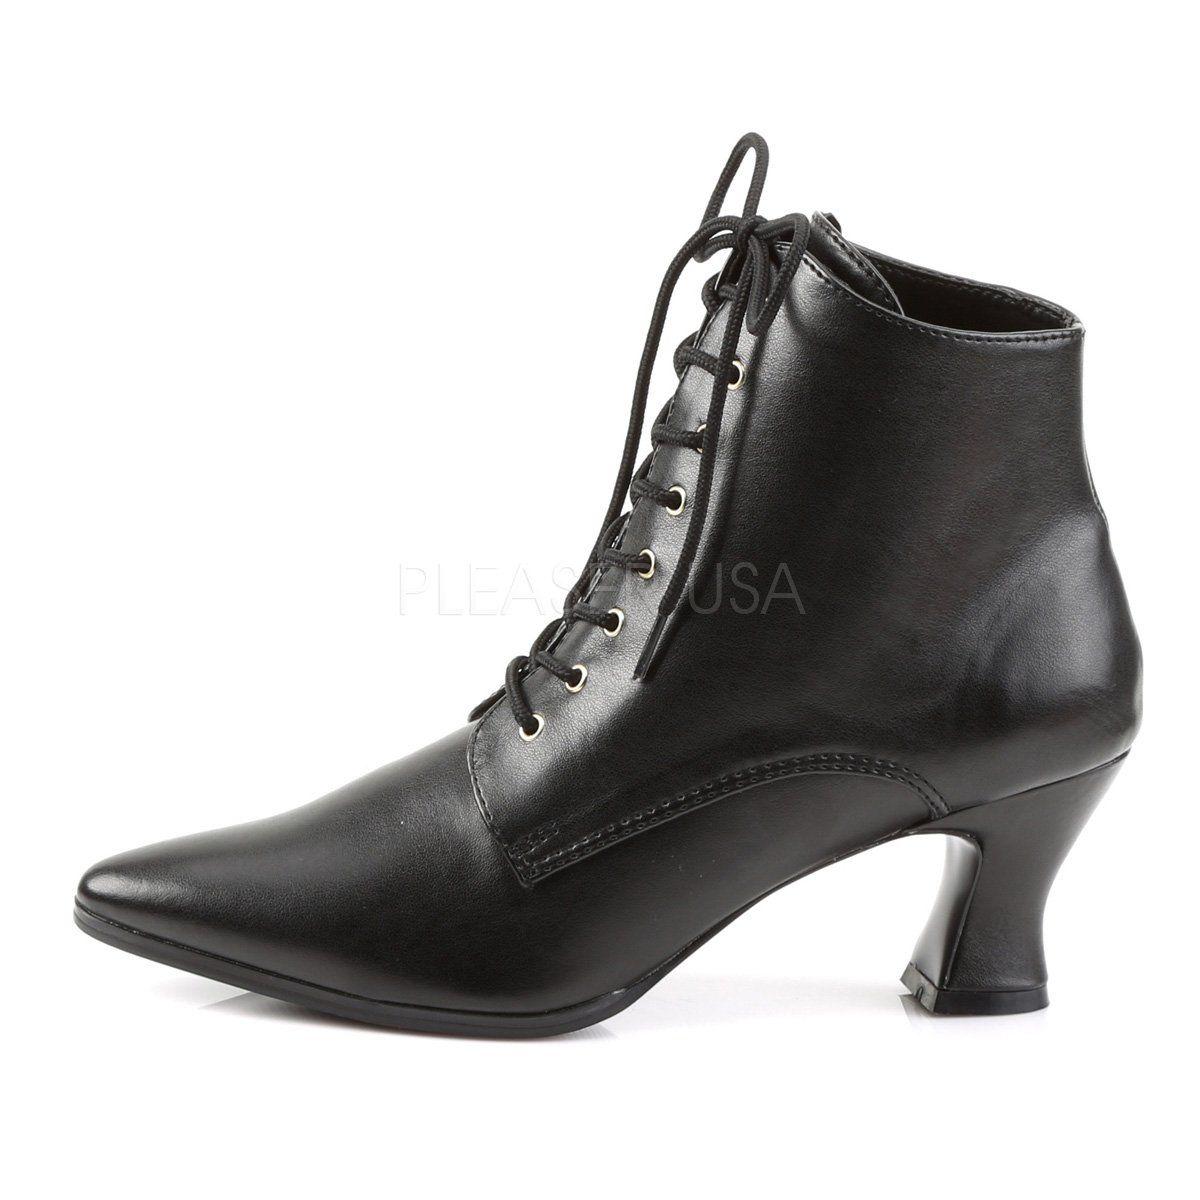 Funtasma Victorian 35 Black Pu Women S Boots Boots Womens Boots Ankle Kitten Heel Boots